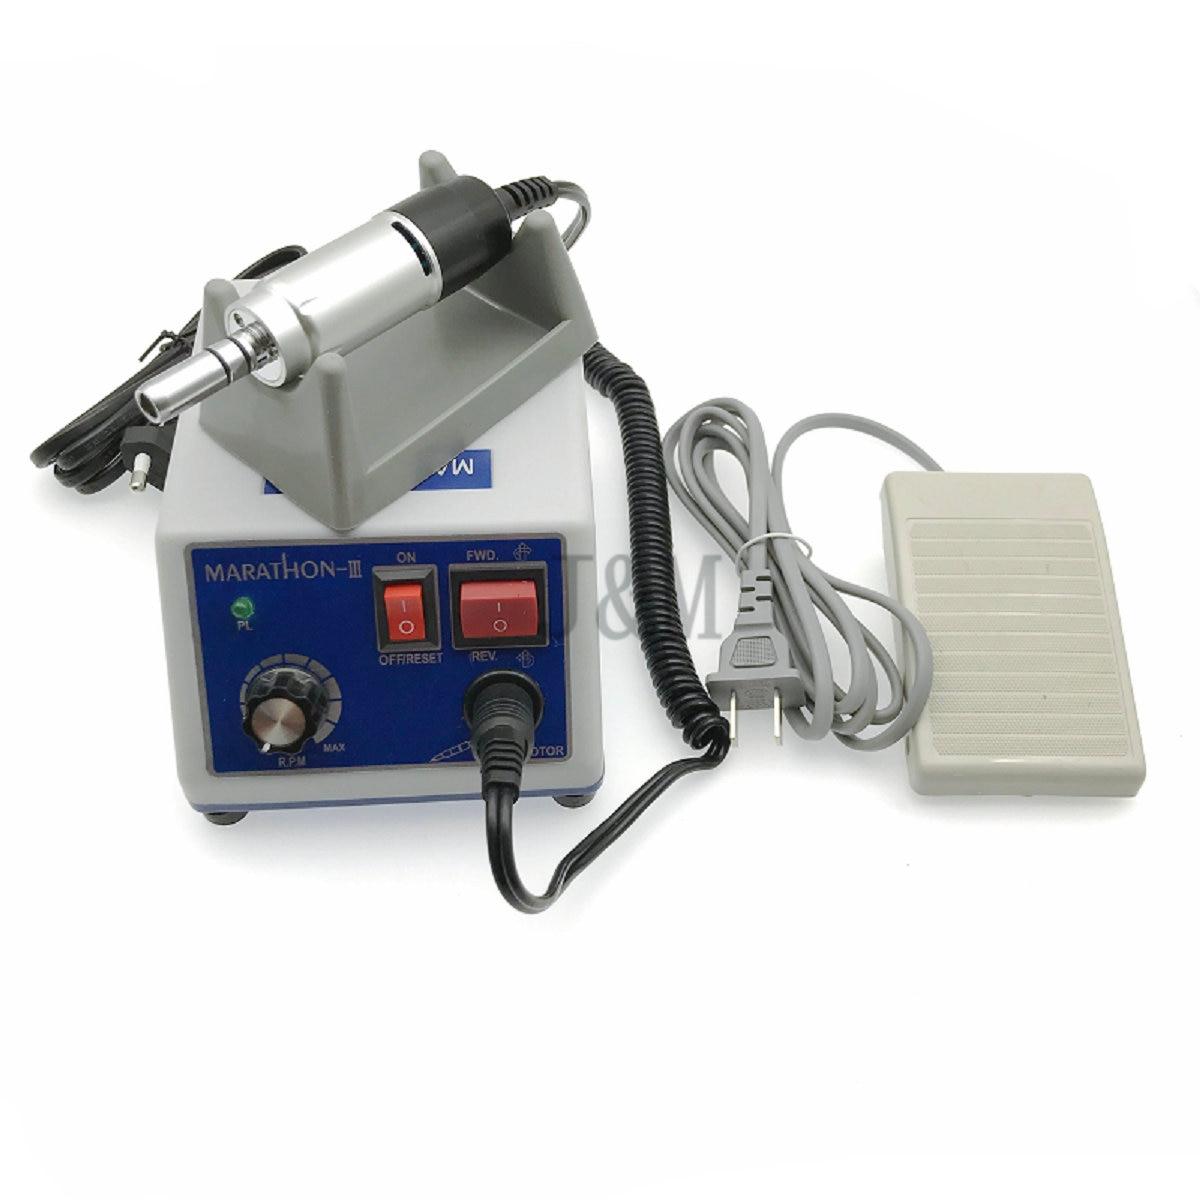 Dental Lab MARATHON Micromotor Machine N3 + Electric Micro Motor-in Teeth Whitening from Beauty & Health